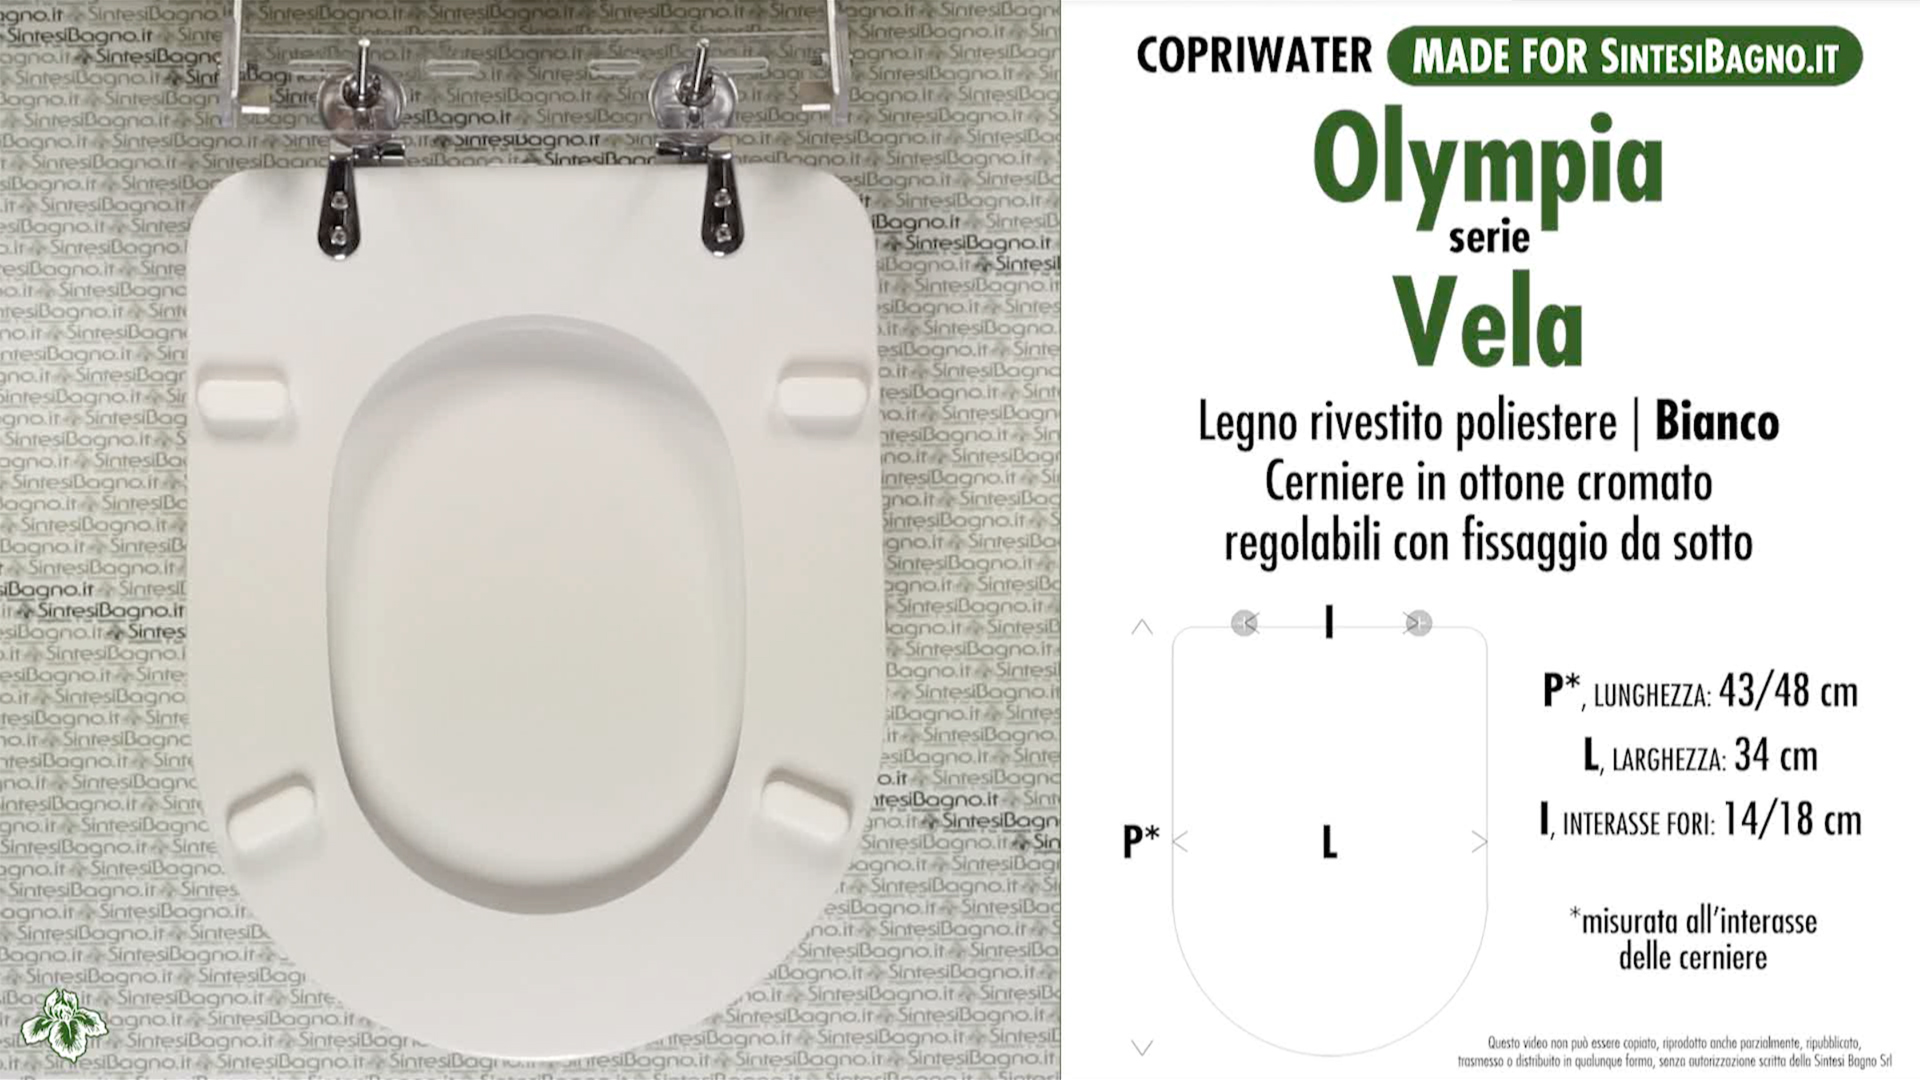 SCHEDA TECNICA MISURE copriwater OLYMPIA VELA